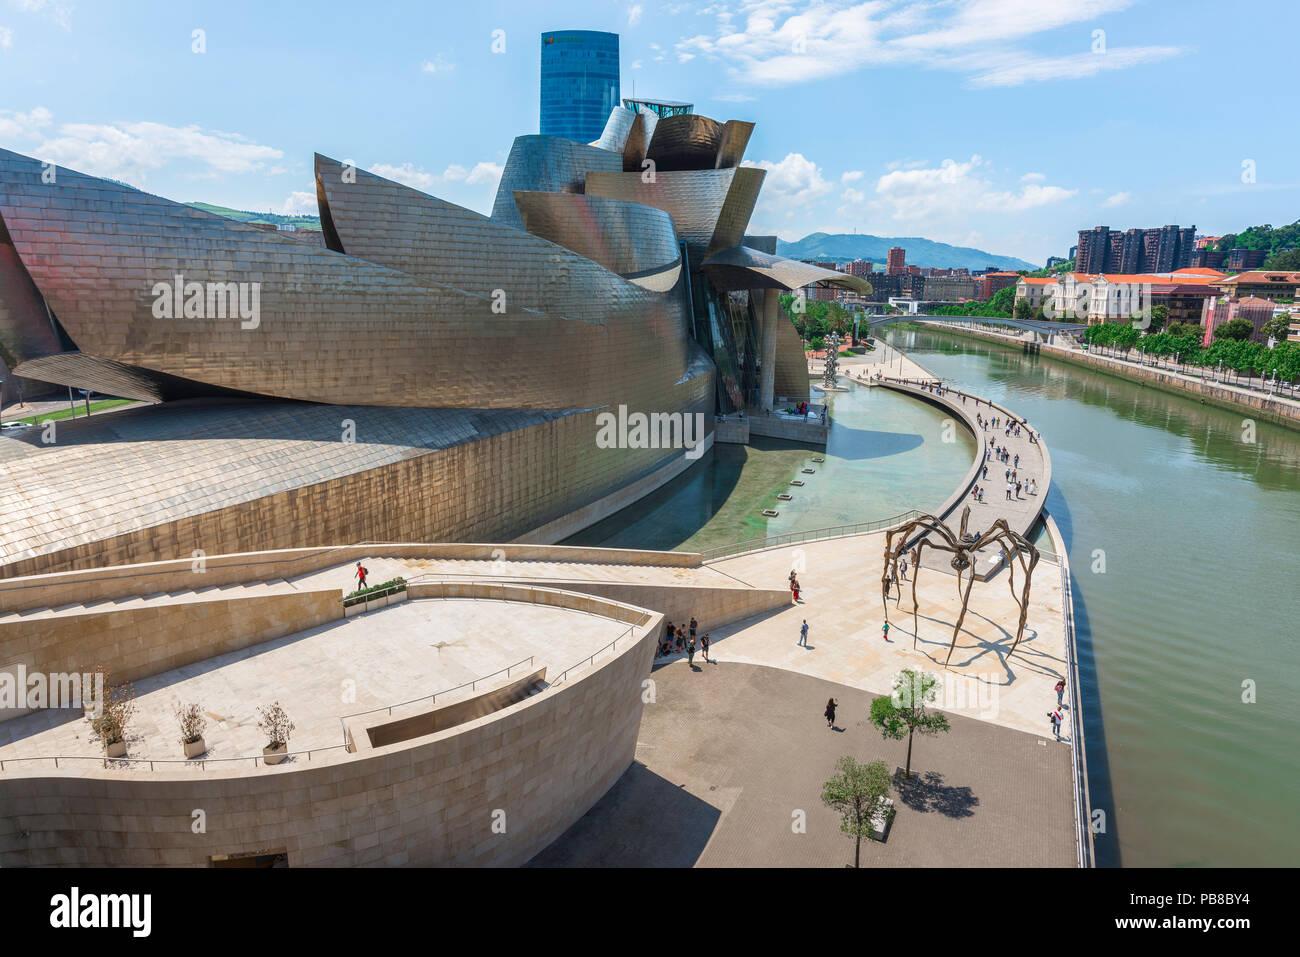 Guggenheim Museo.Guggenheim Museum Bilbao View Of The Frank Gehry Designed